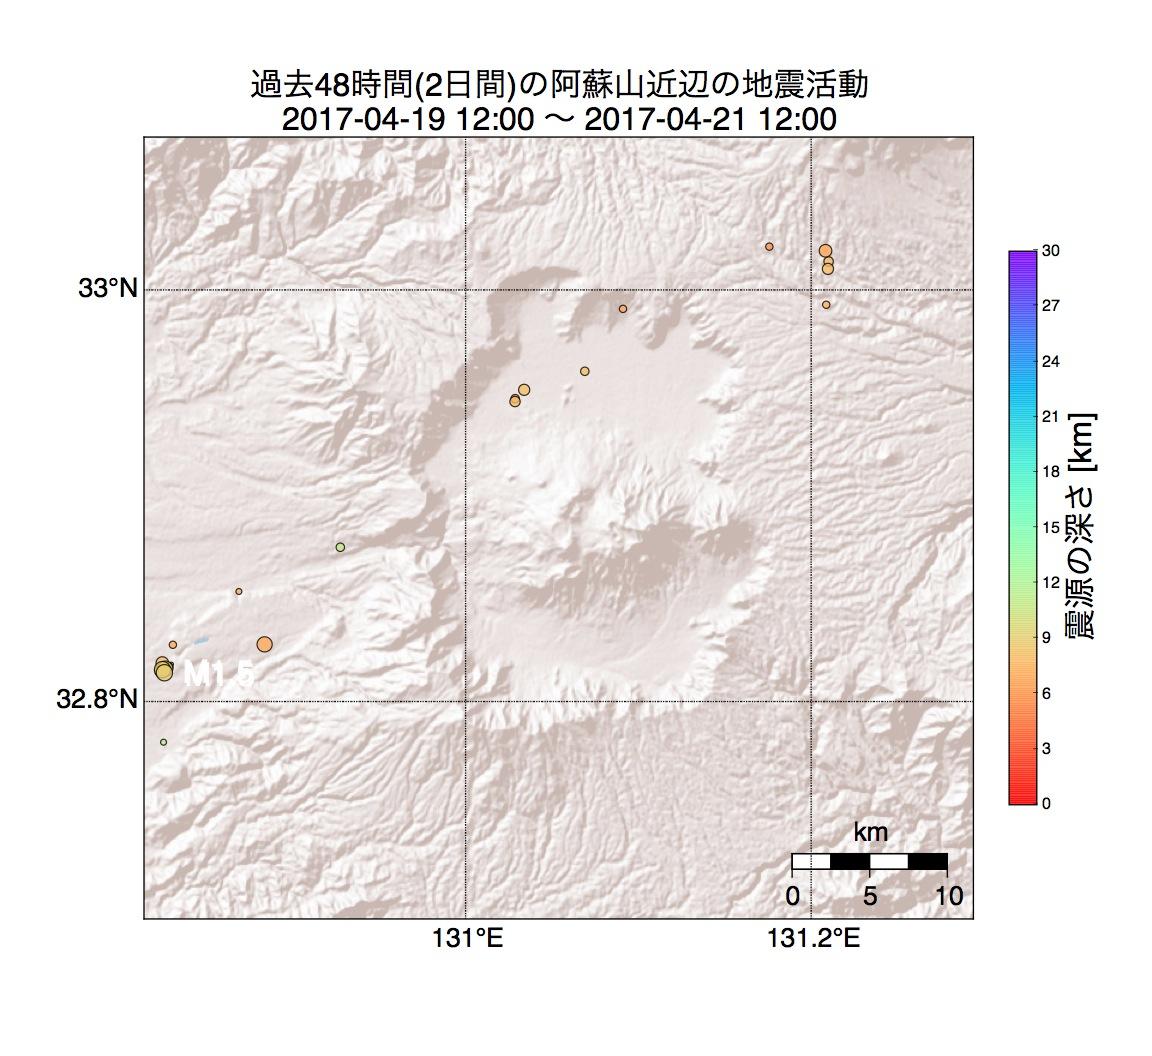 http://jishin.chamu.org/aso/20170421_1.jpg